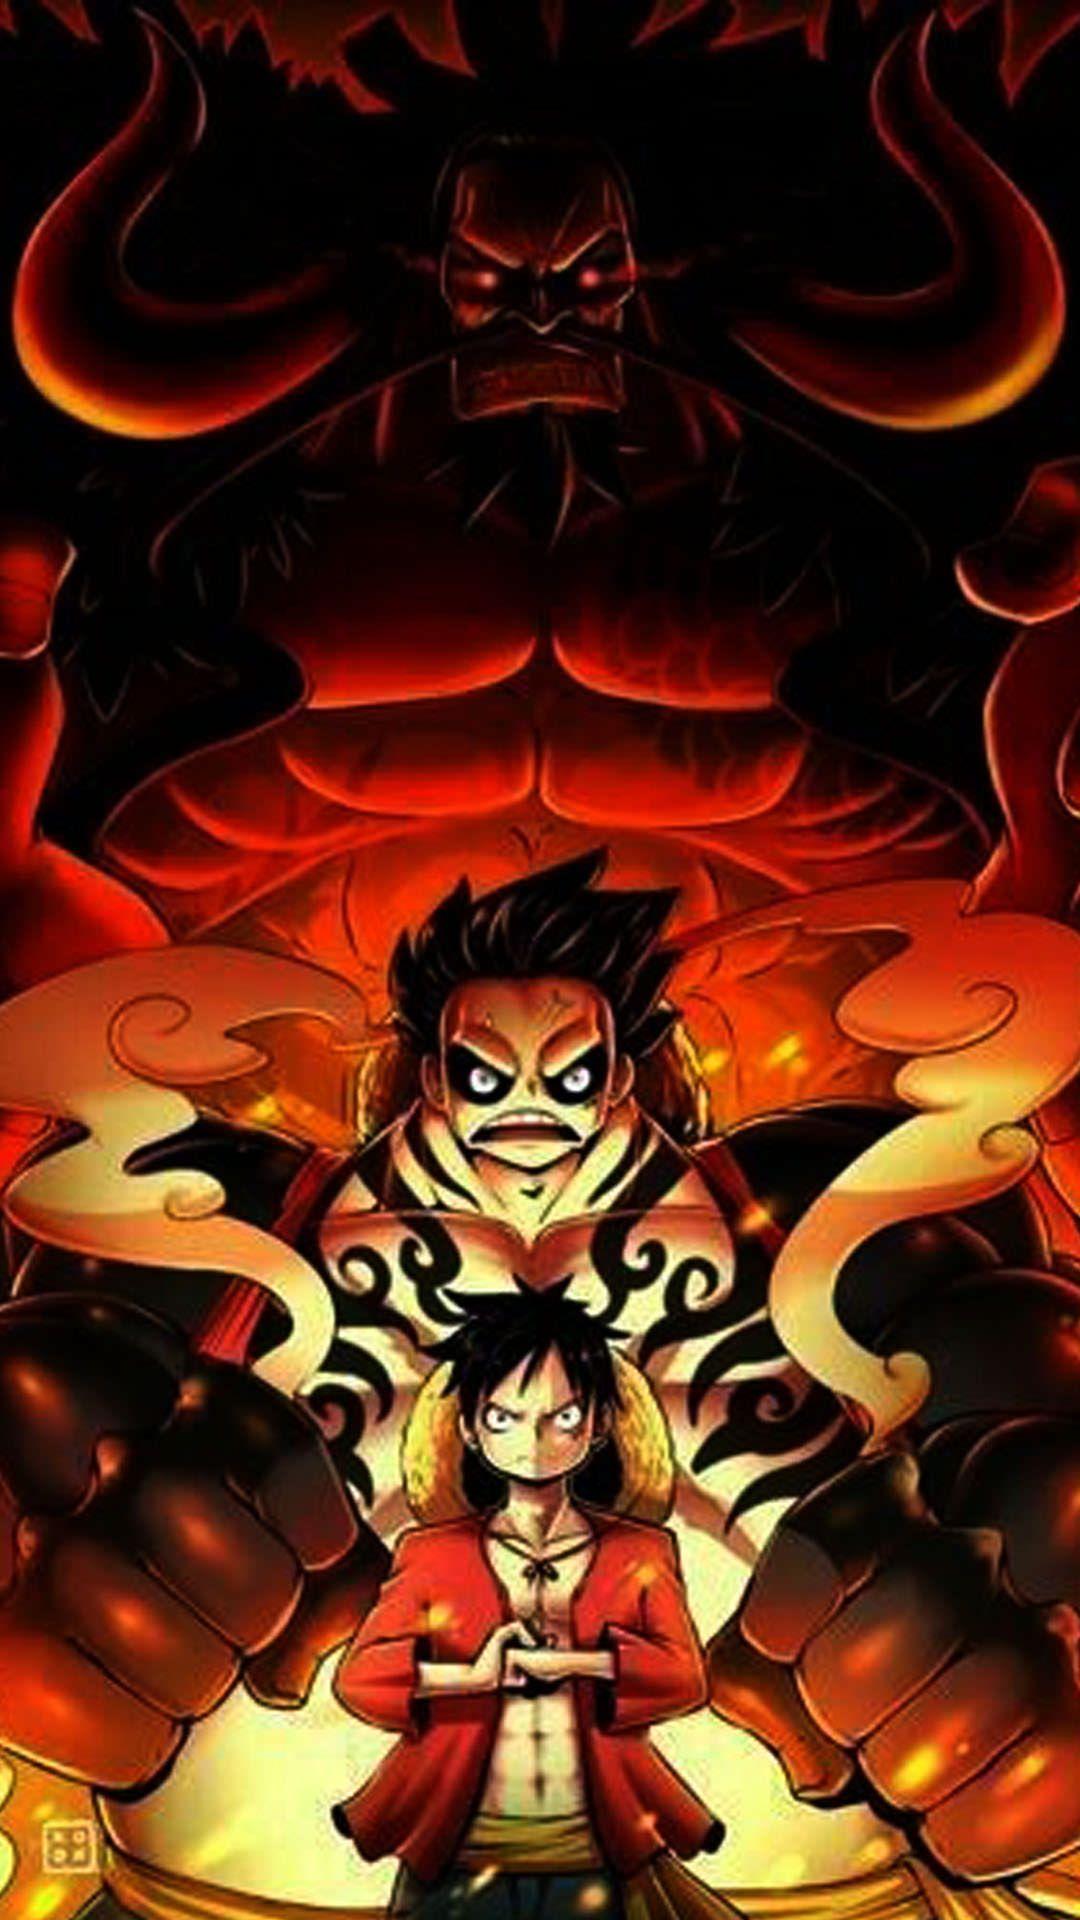 Kaido wallpaper 6 Gambar anime, Animasi, Seni anime